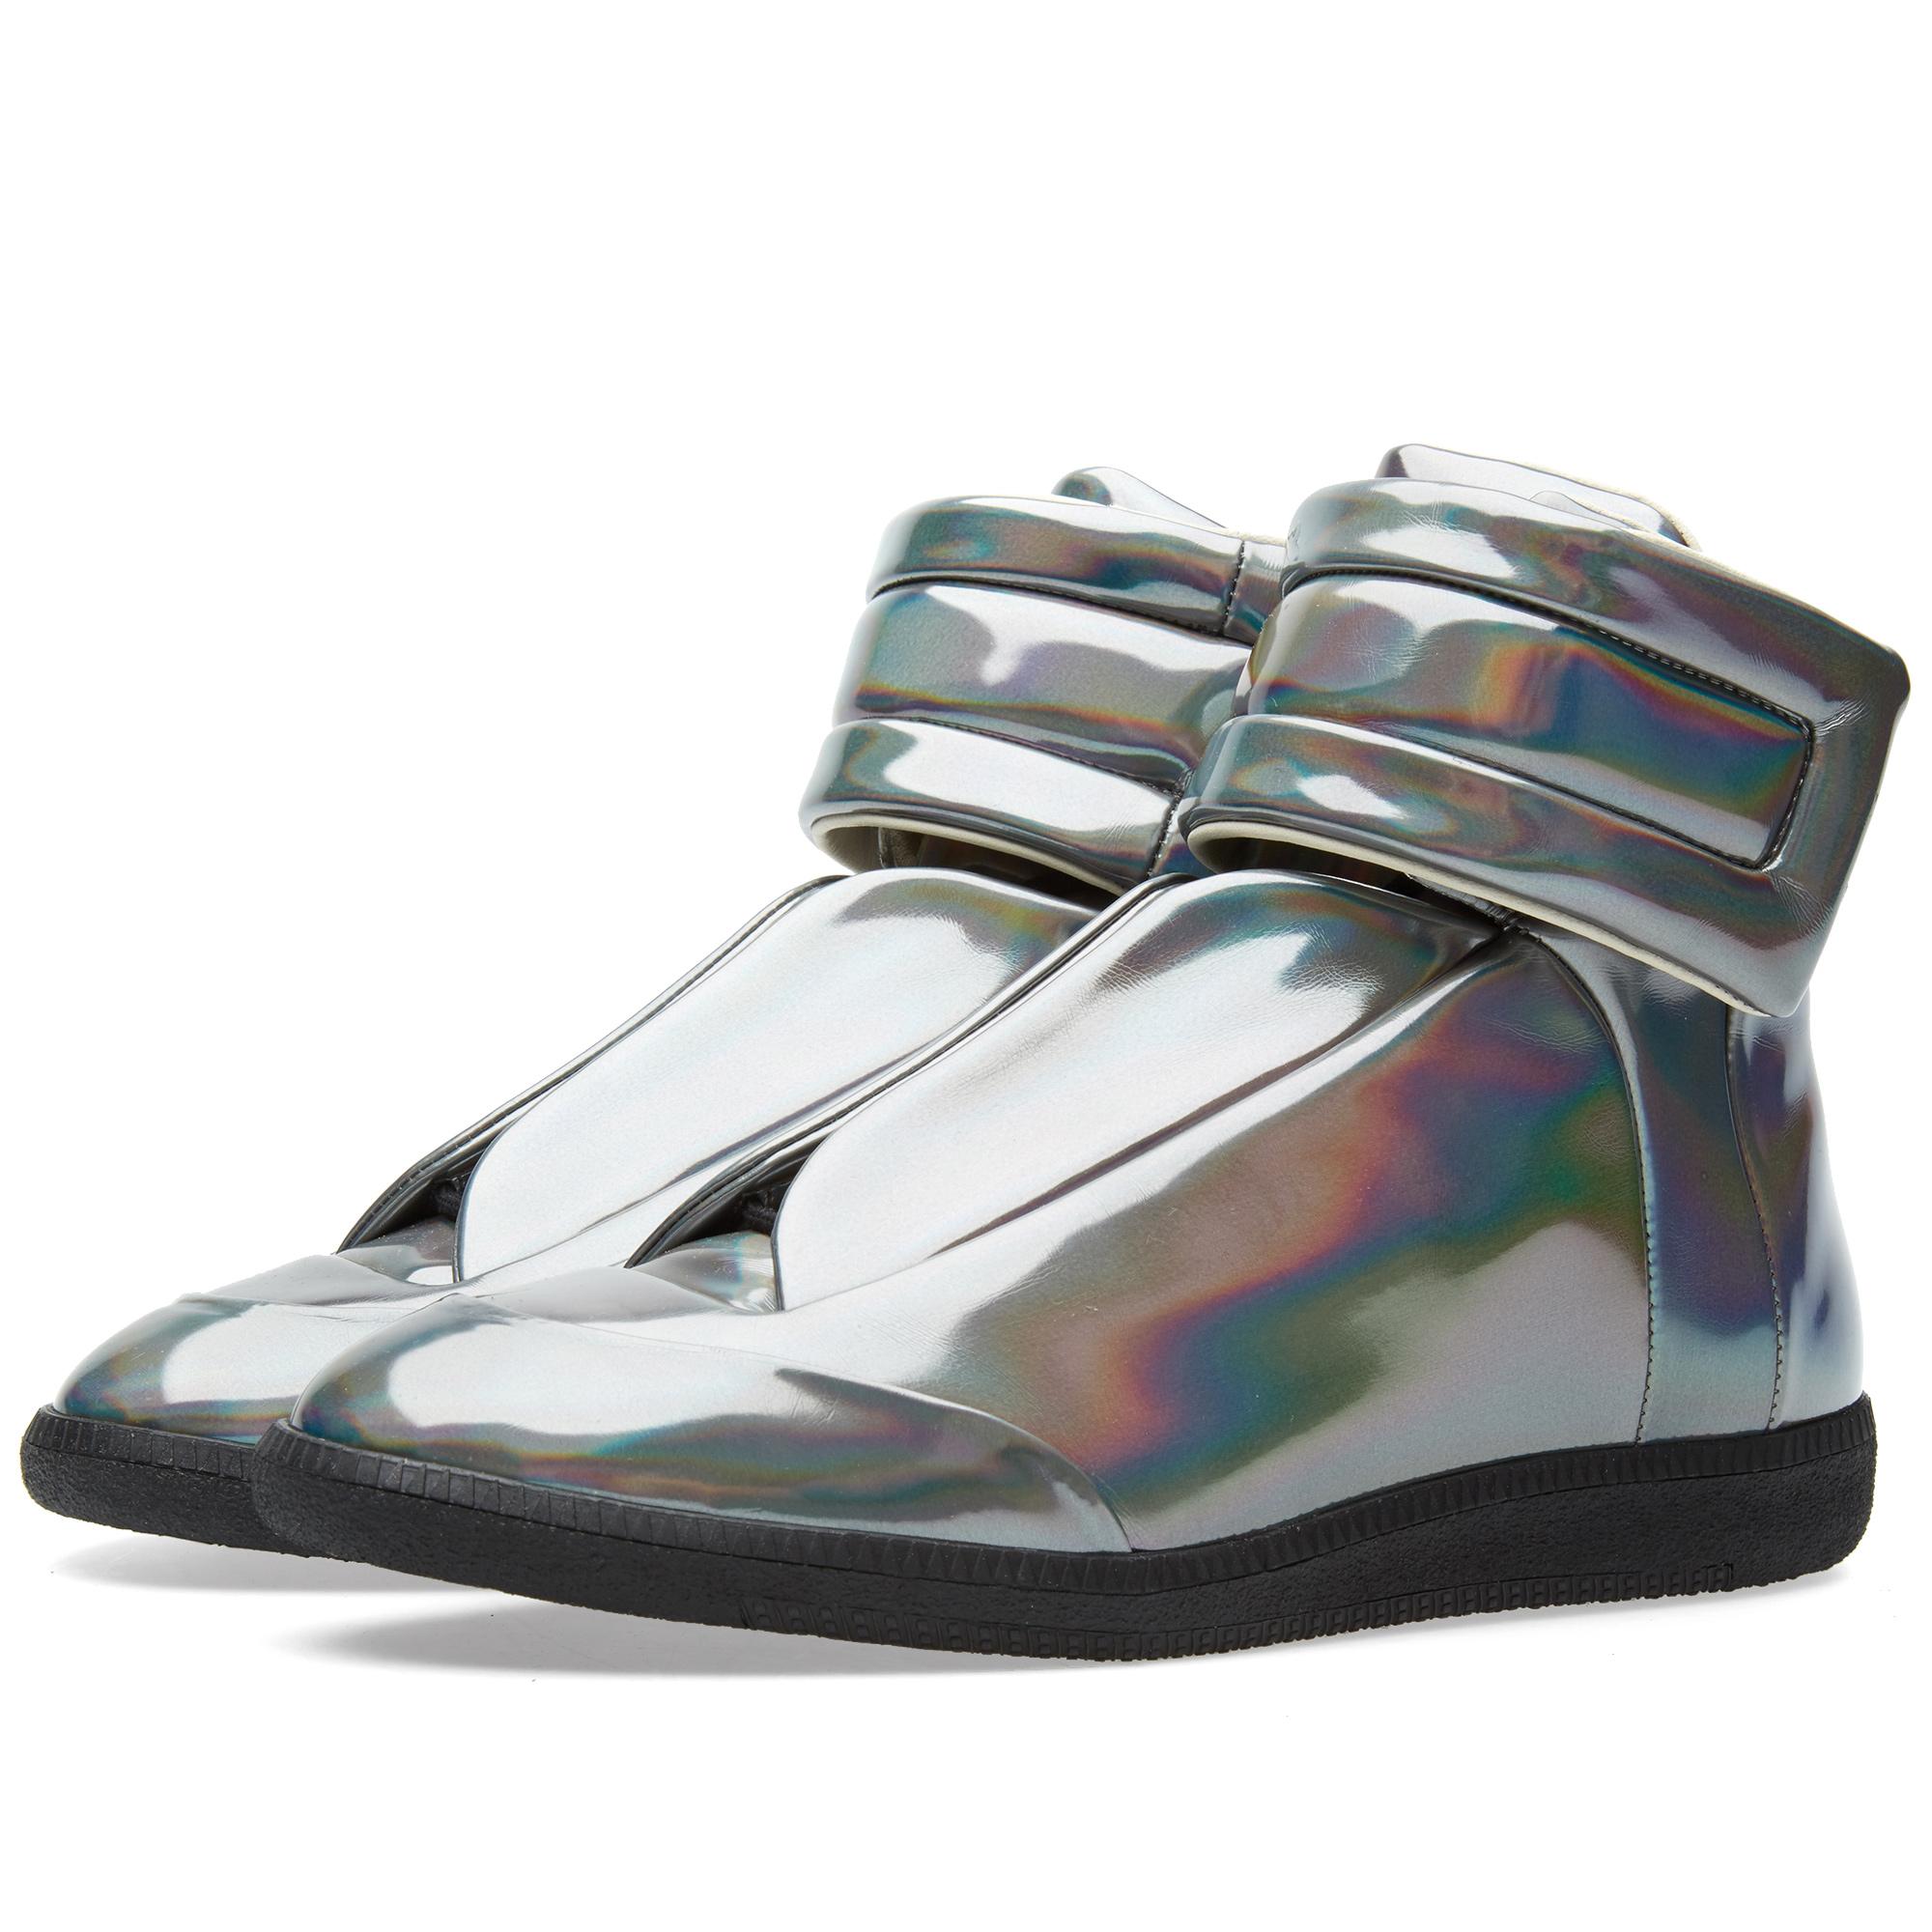 Maison margiela 22 future high hologram sneaker gunmetal for Maison margiela 22